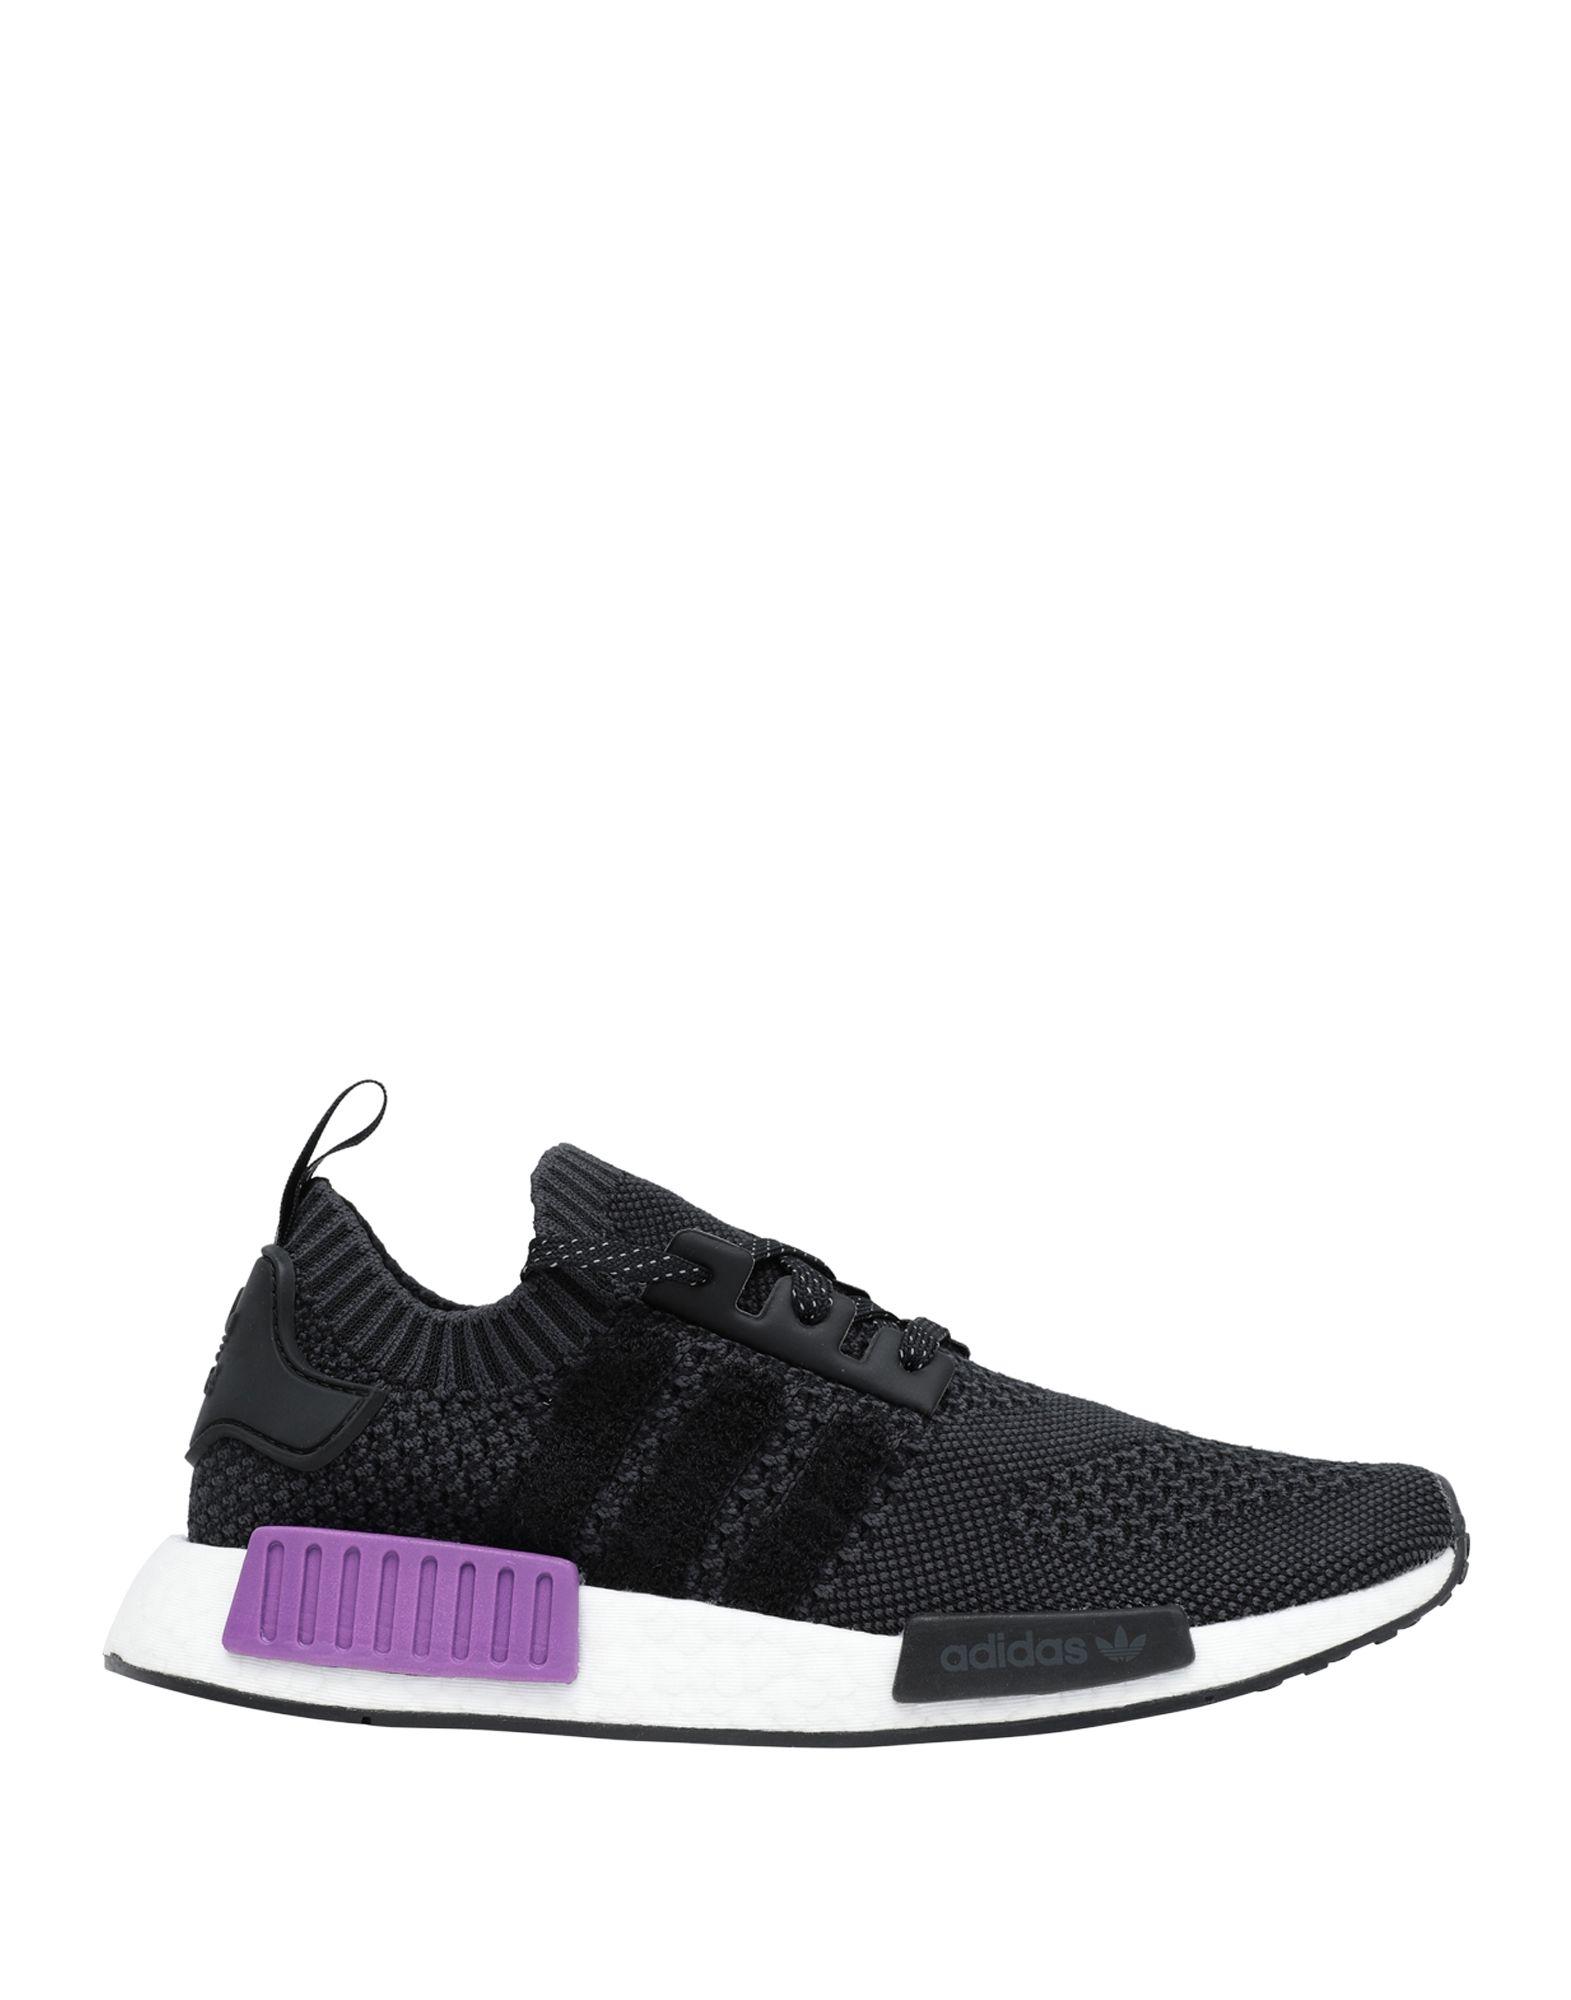 ADIDAS ORIGINALS Низкие кеды и кроссовки kids sneakers adidas nmd